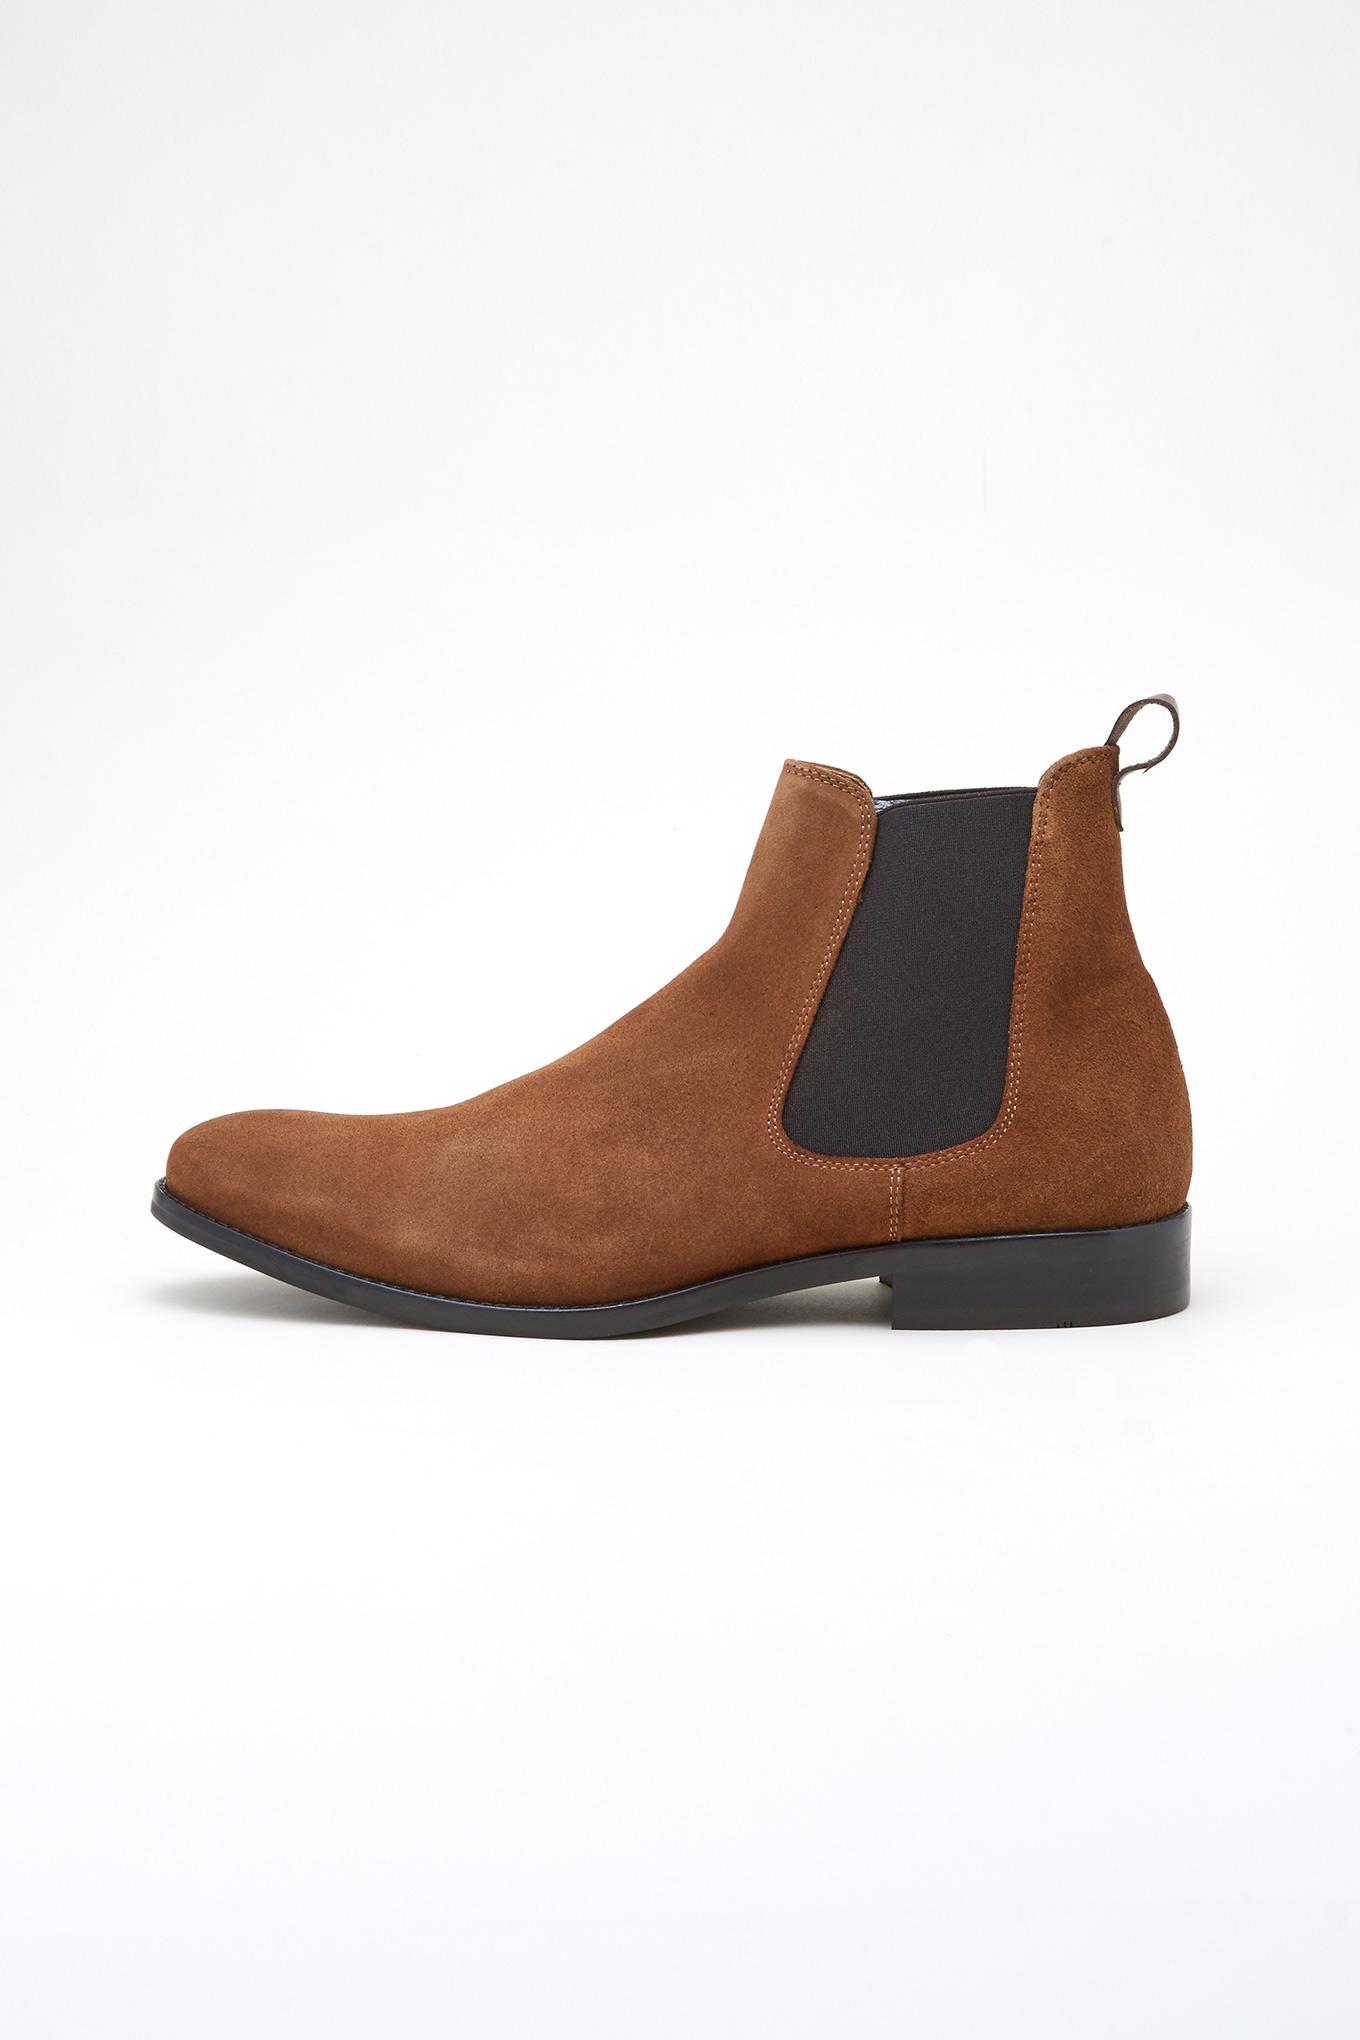 Boots Cognac Casual Man